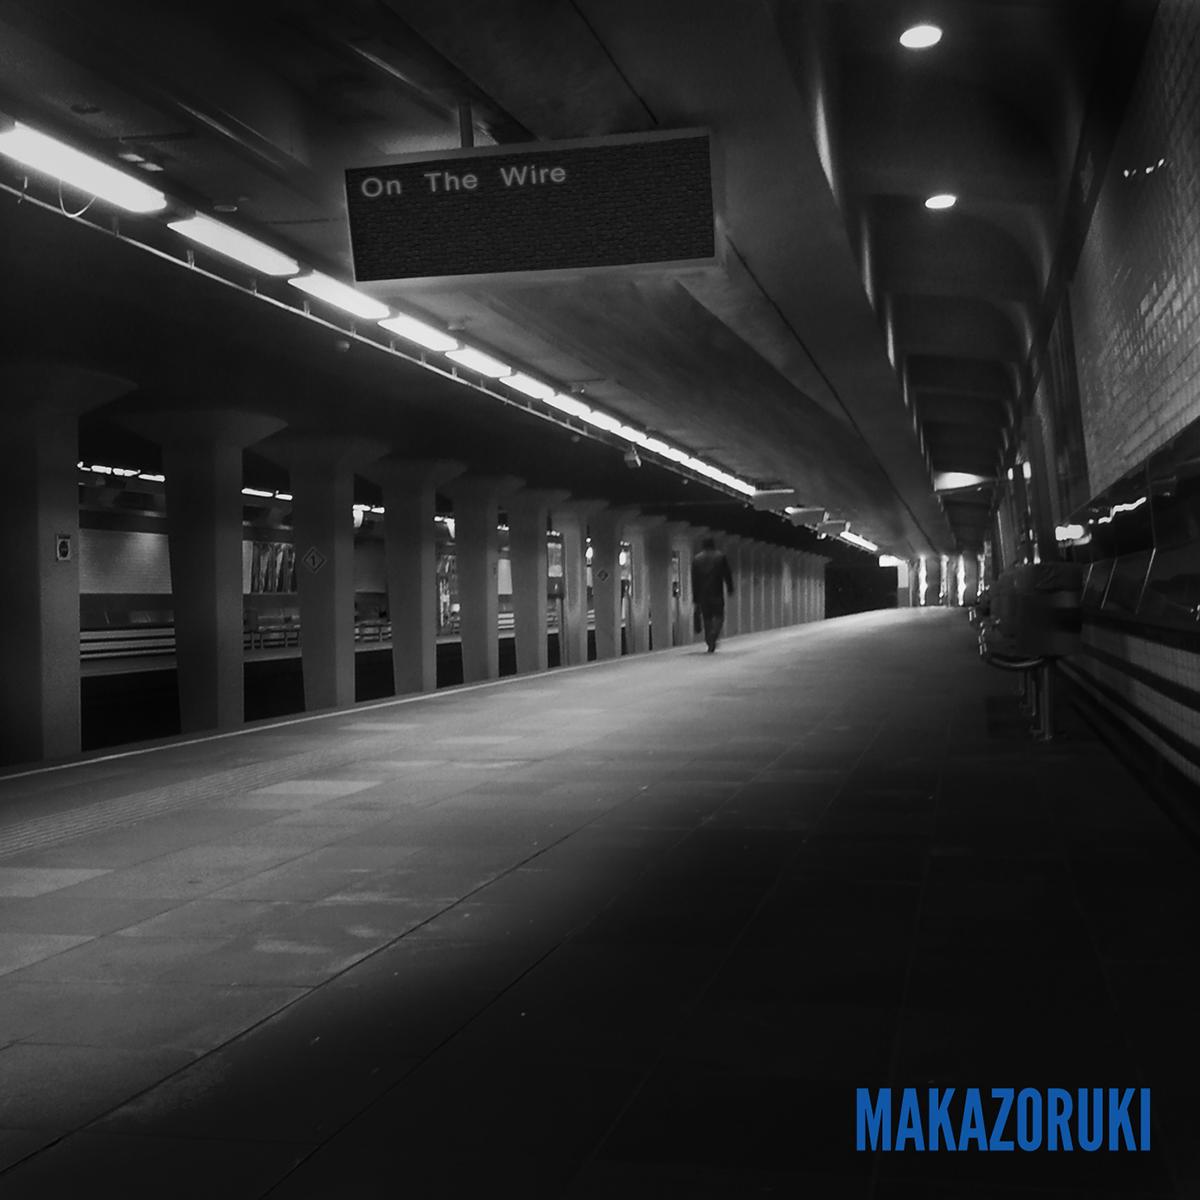 MAKAZORUKI - On the Wire